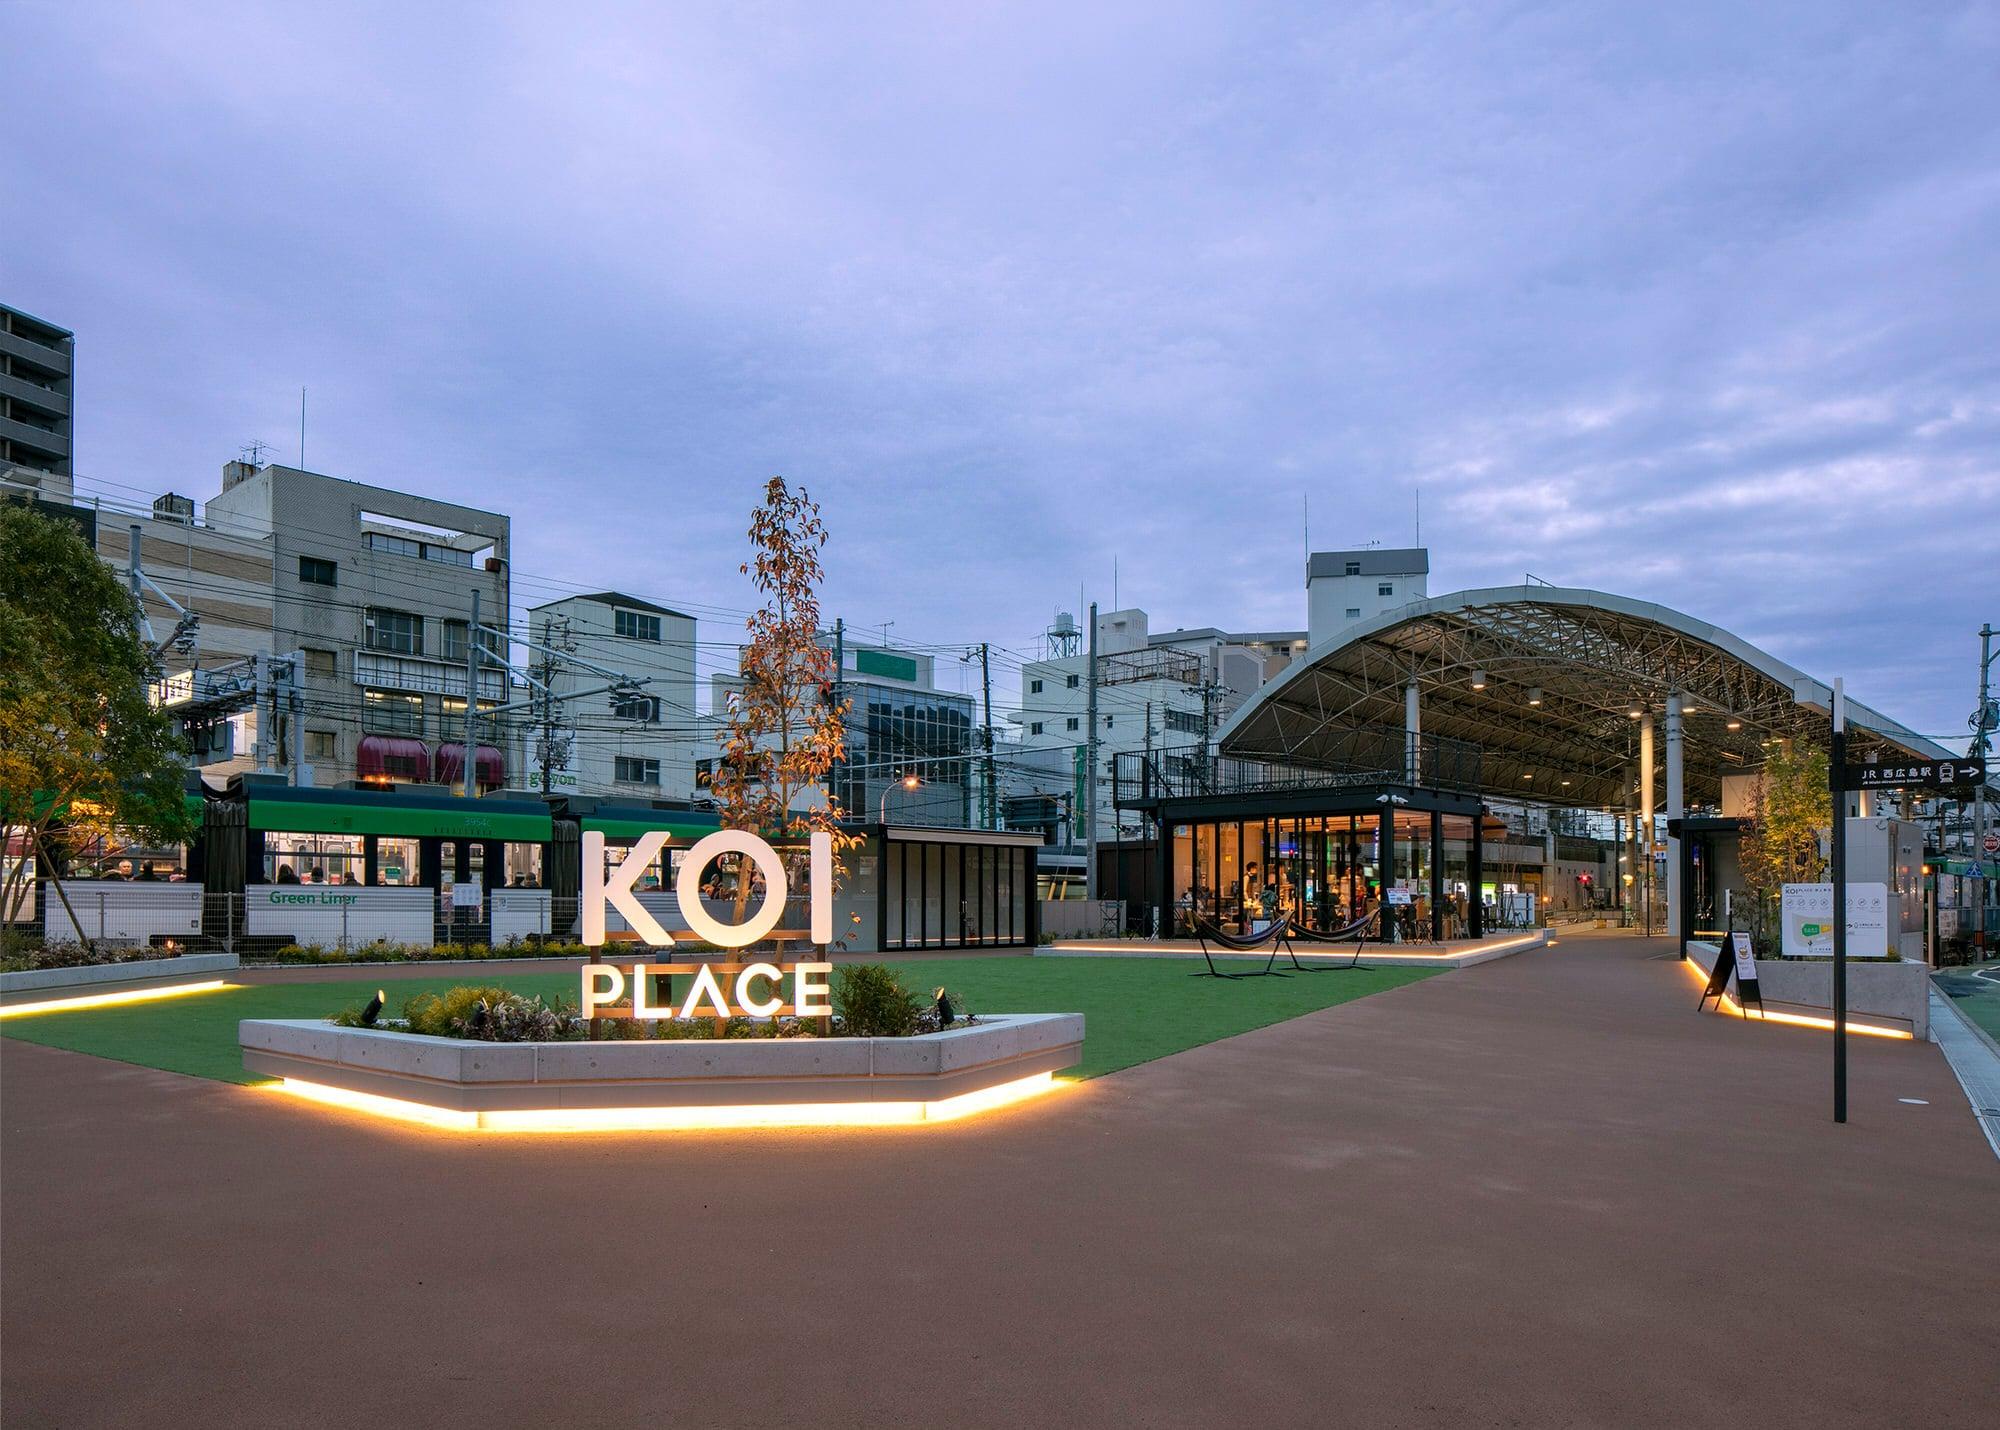 KOI PLACE